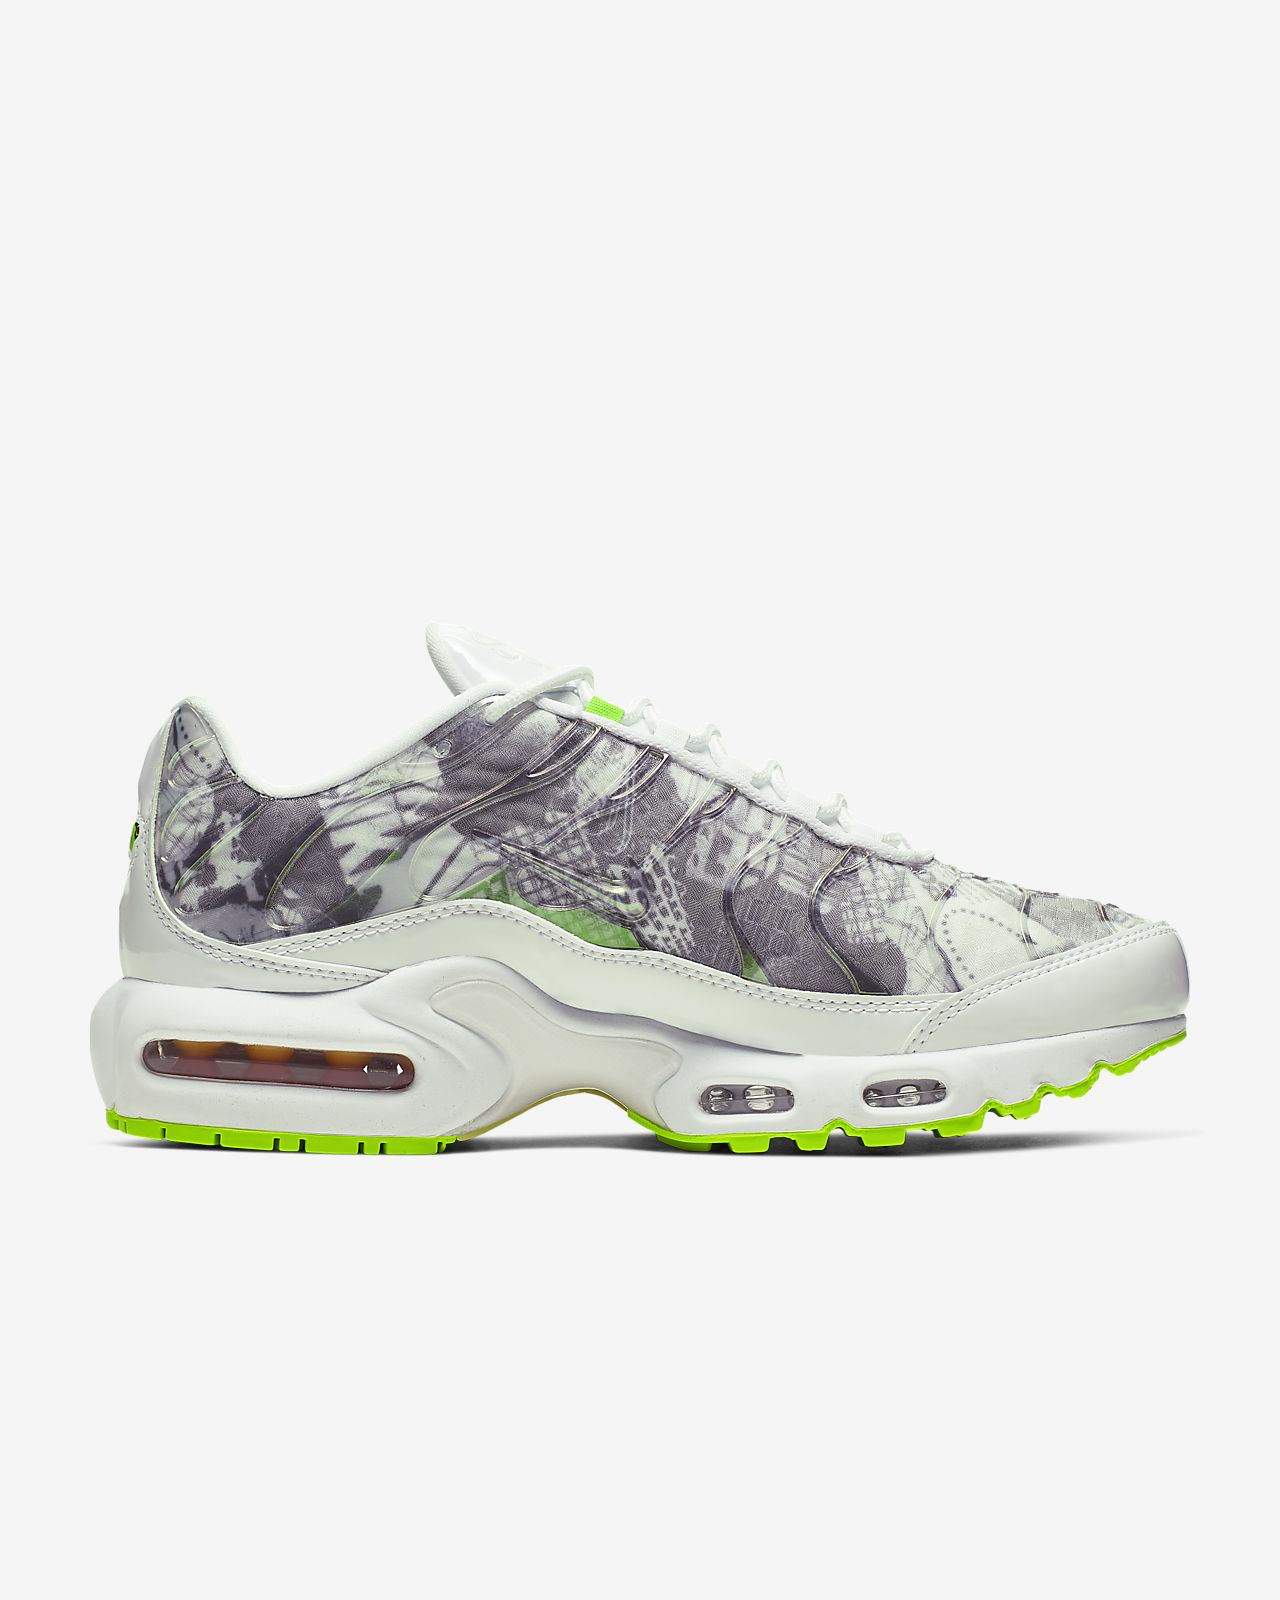 Nike Air Max Plus LX női cipő